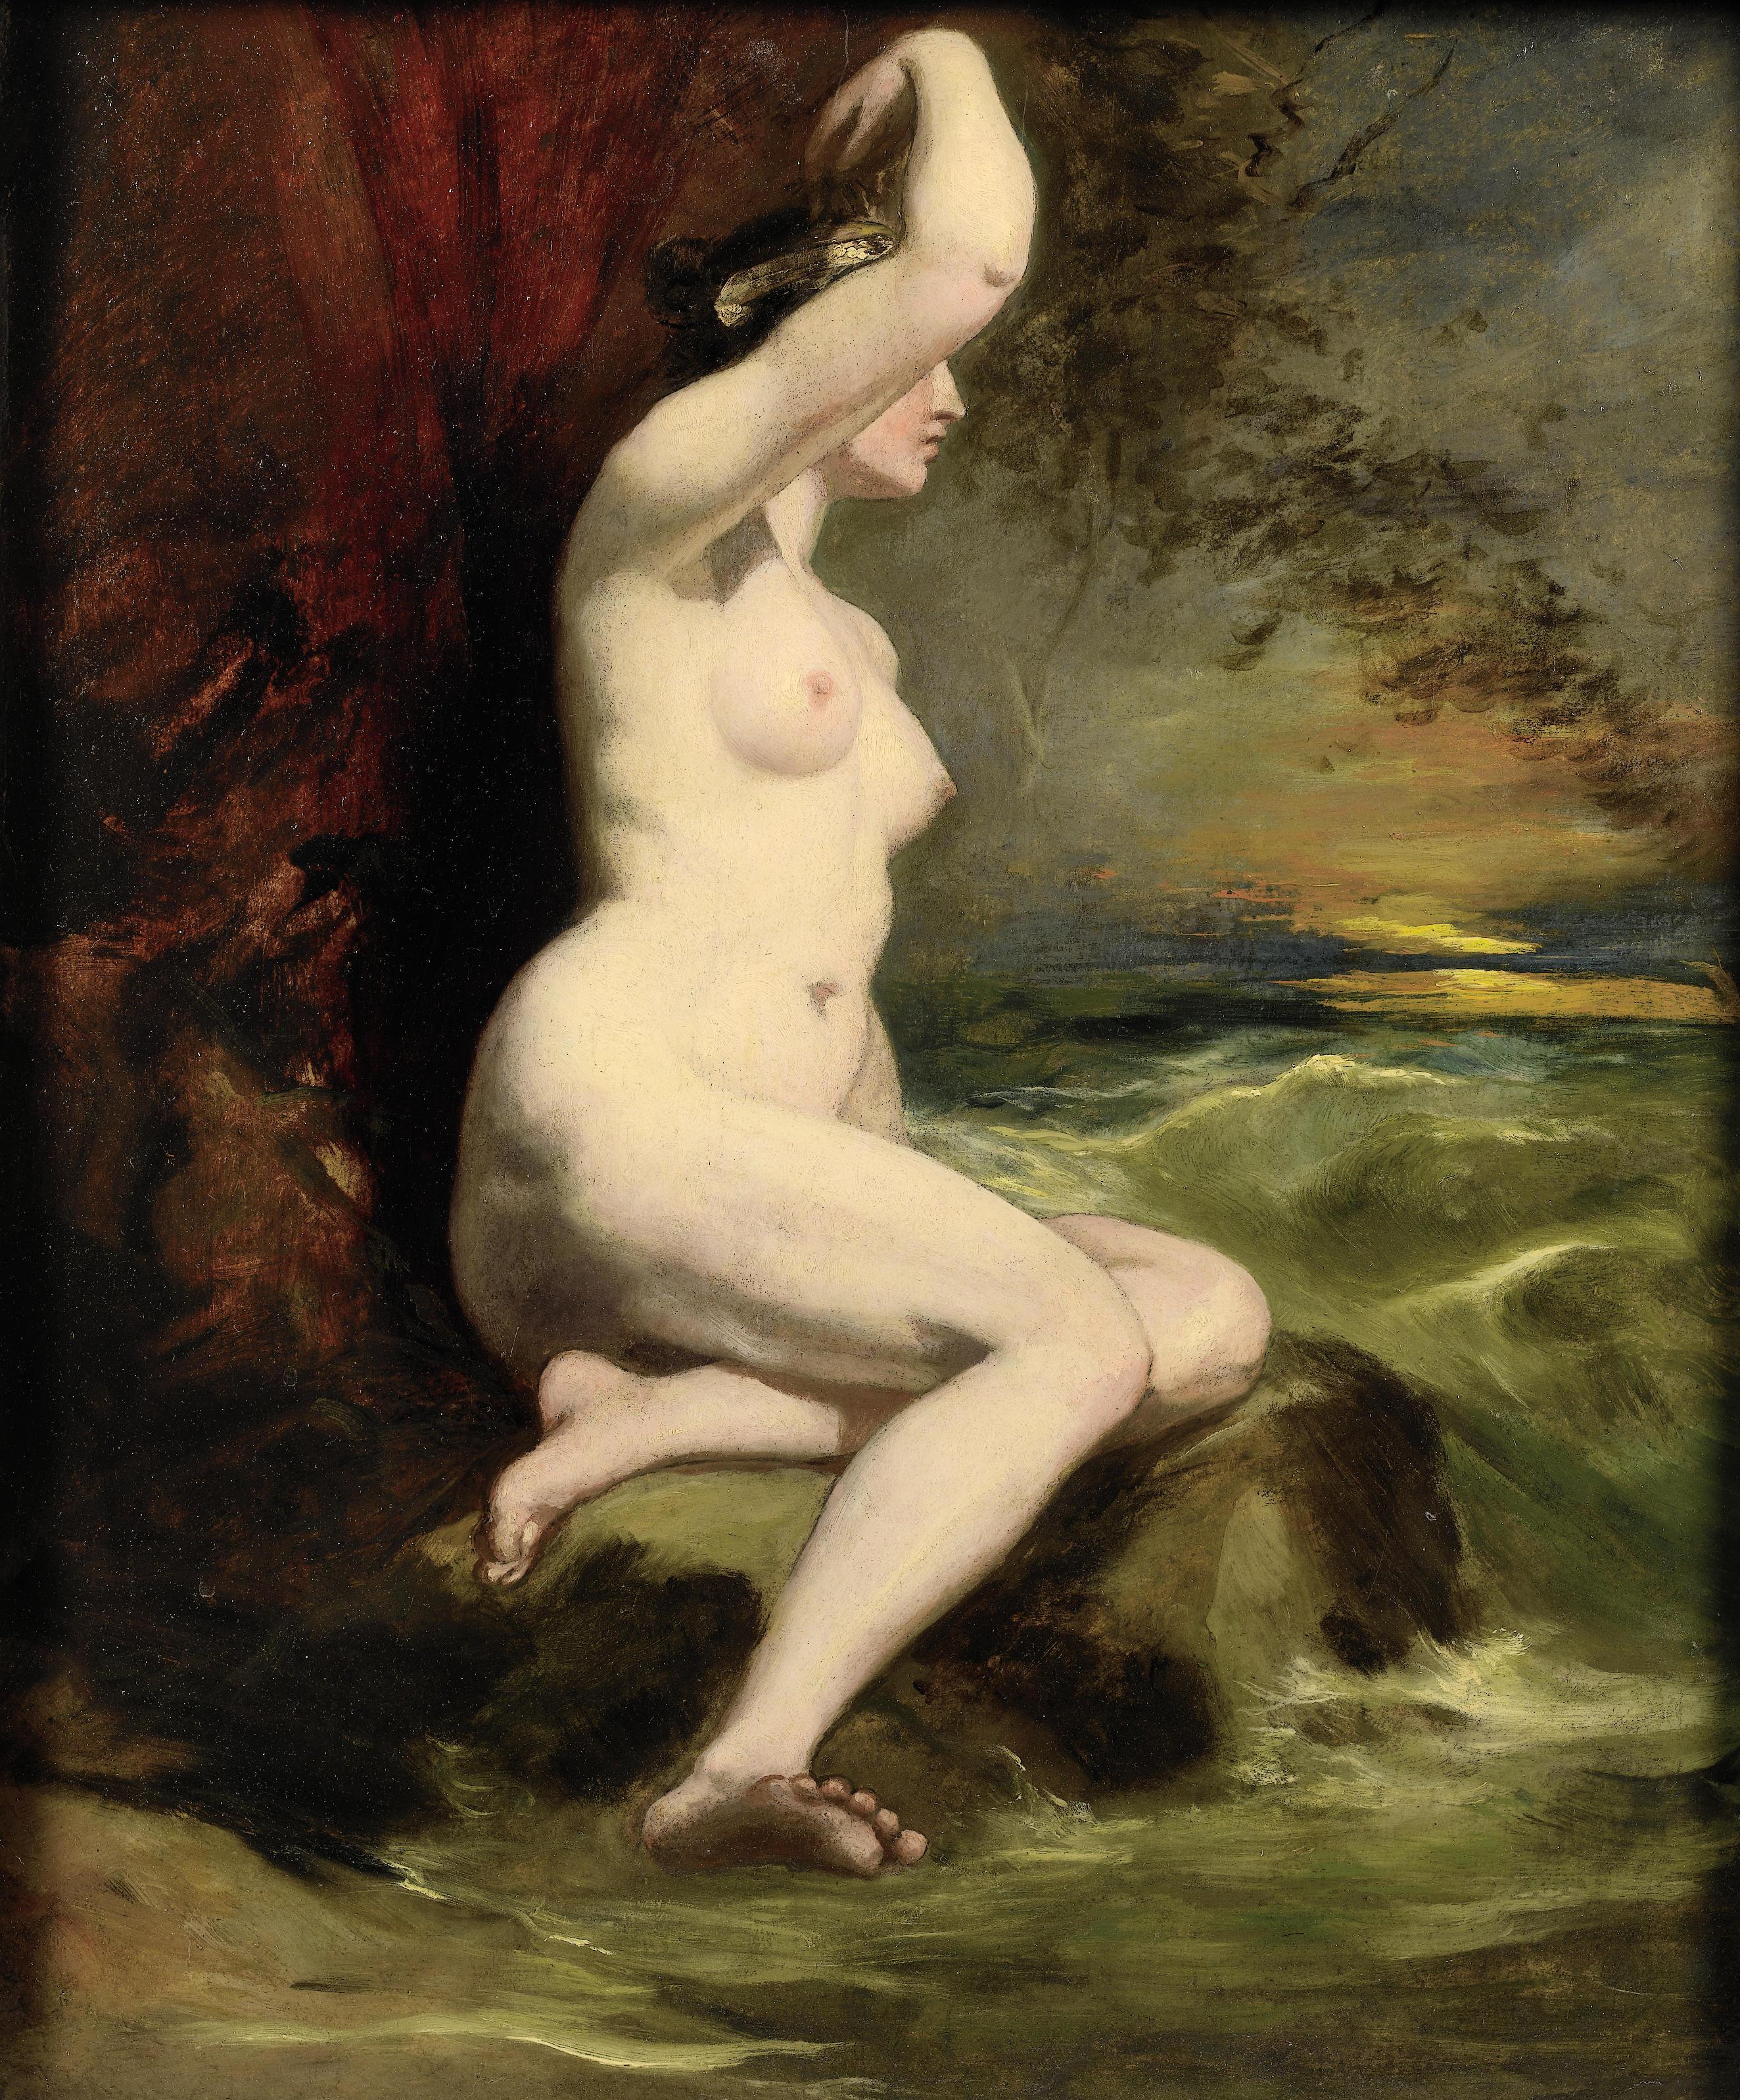 William Etty, 1787-1849. Ариадна. 50 x 42 см. частная коллекция